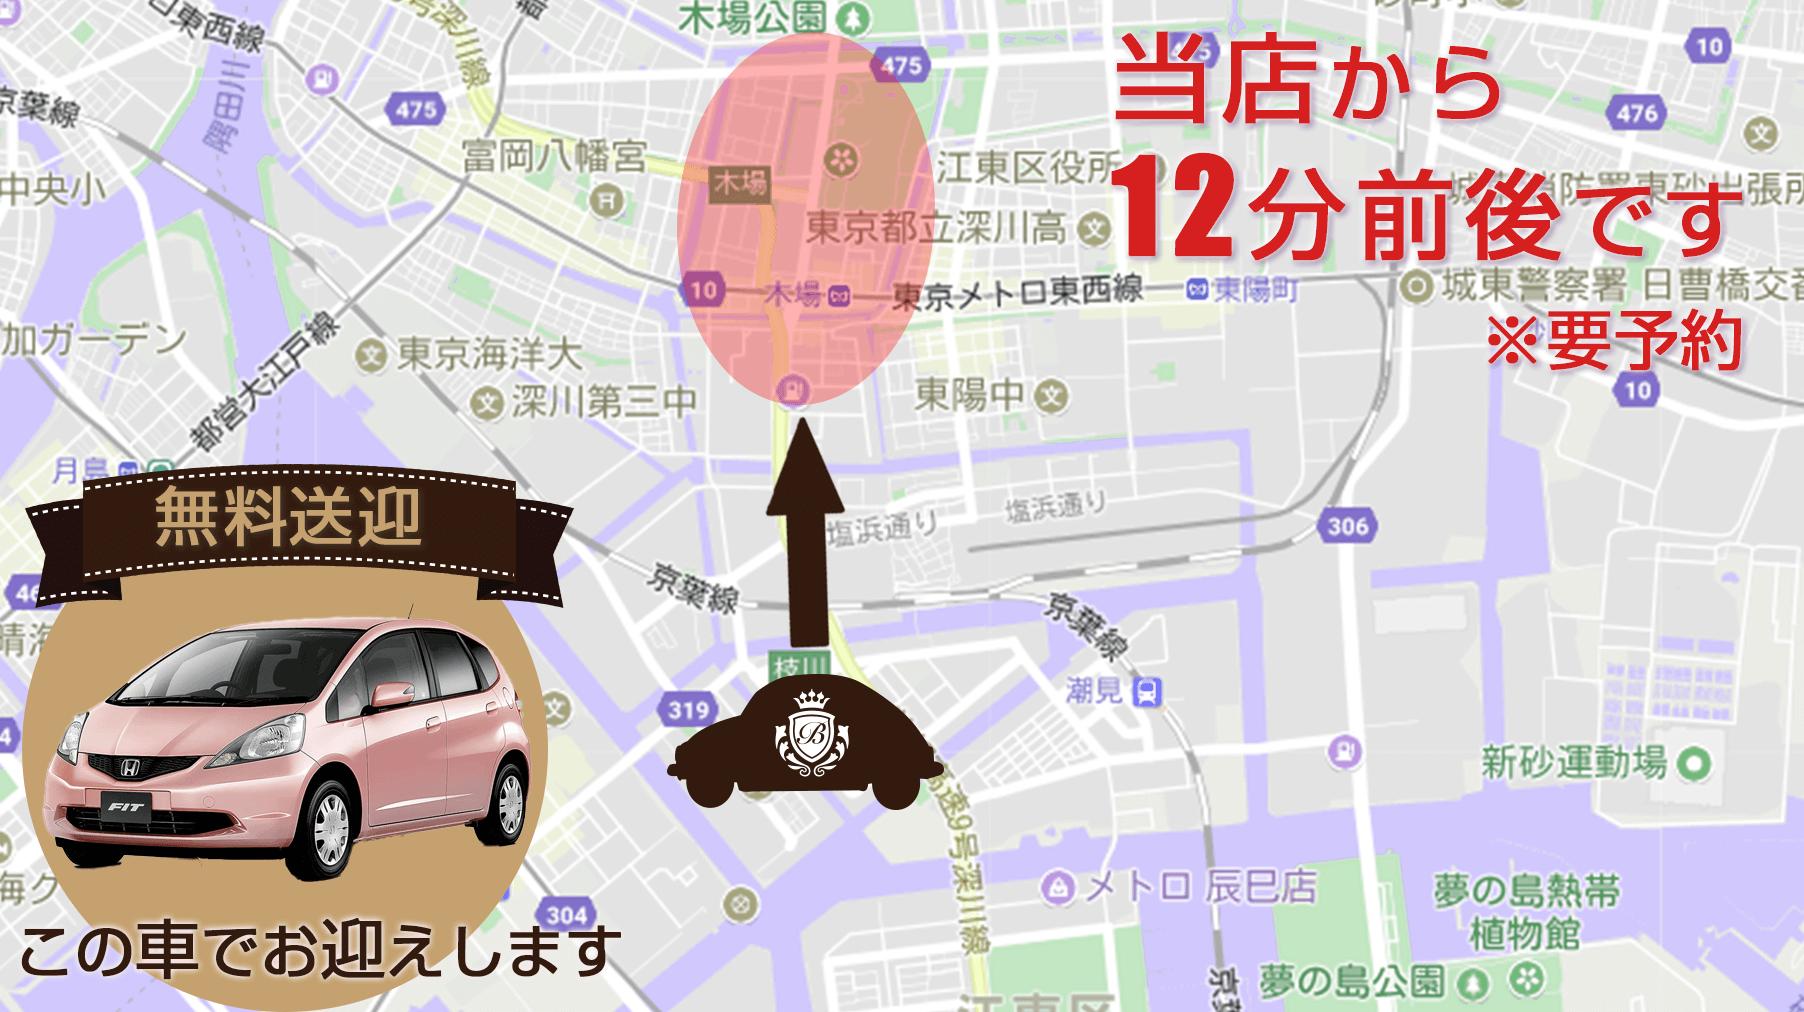 無料送迎地域【木場エリア】